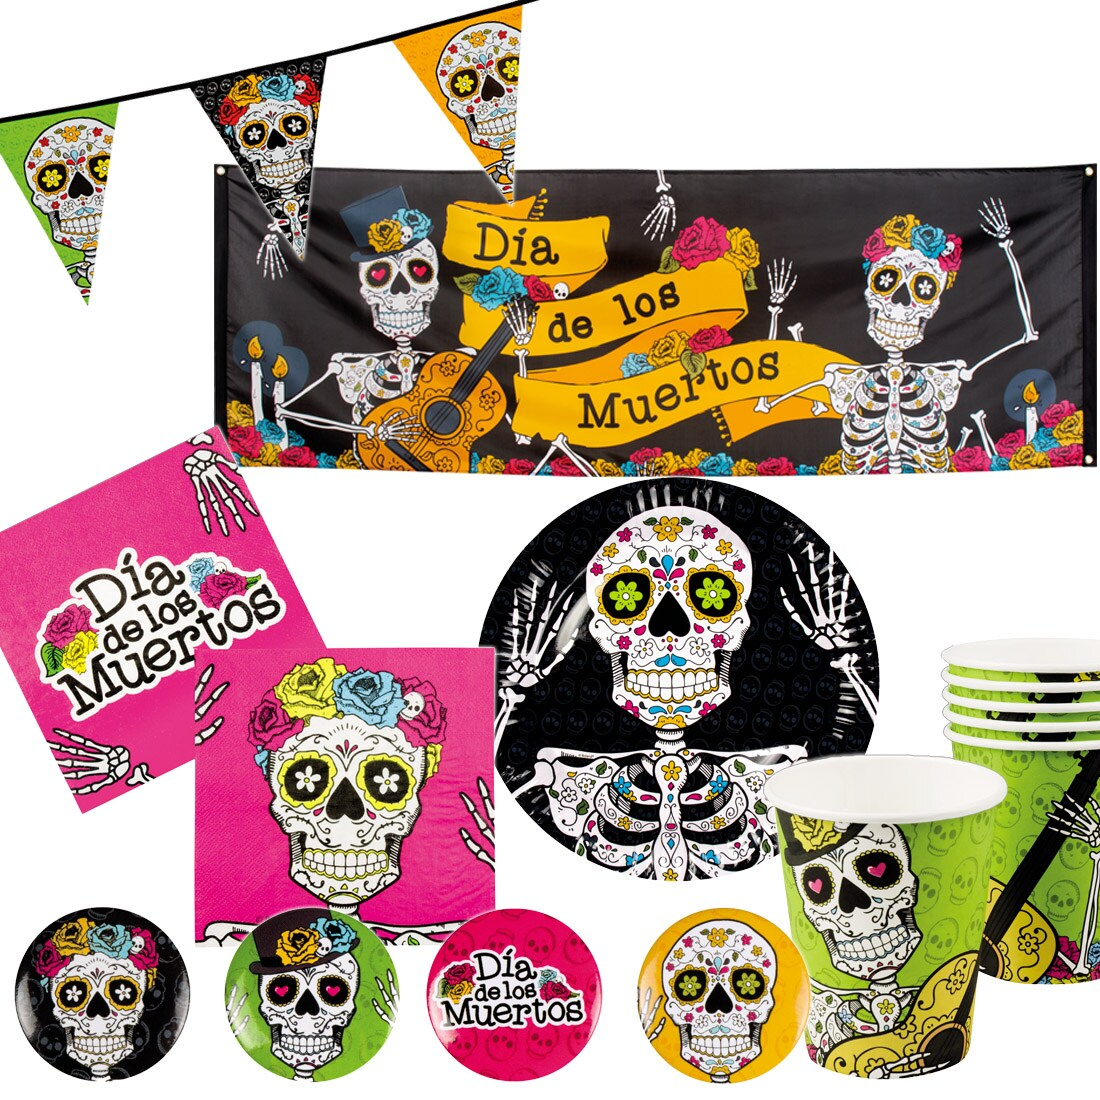 totenkopf deko sugar skull halloween dekoration tag der toten 4 99. Black Bedroom Furniture Sets. Home Design Ideas